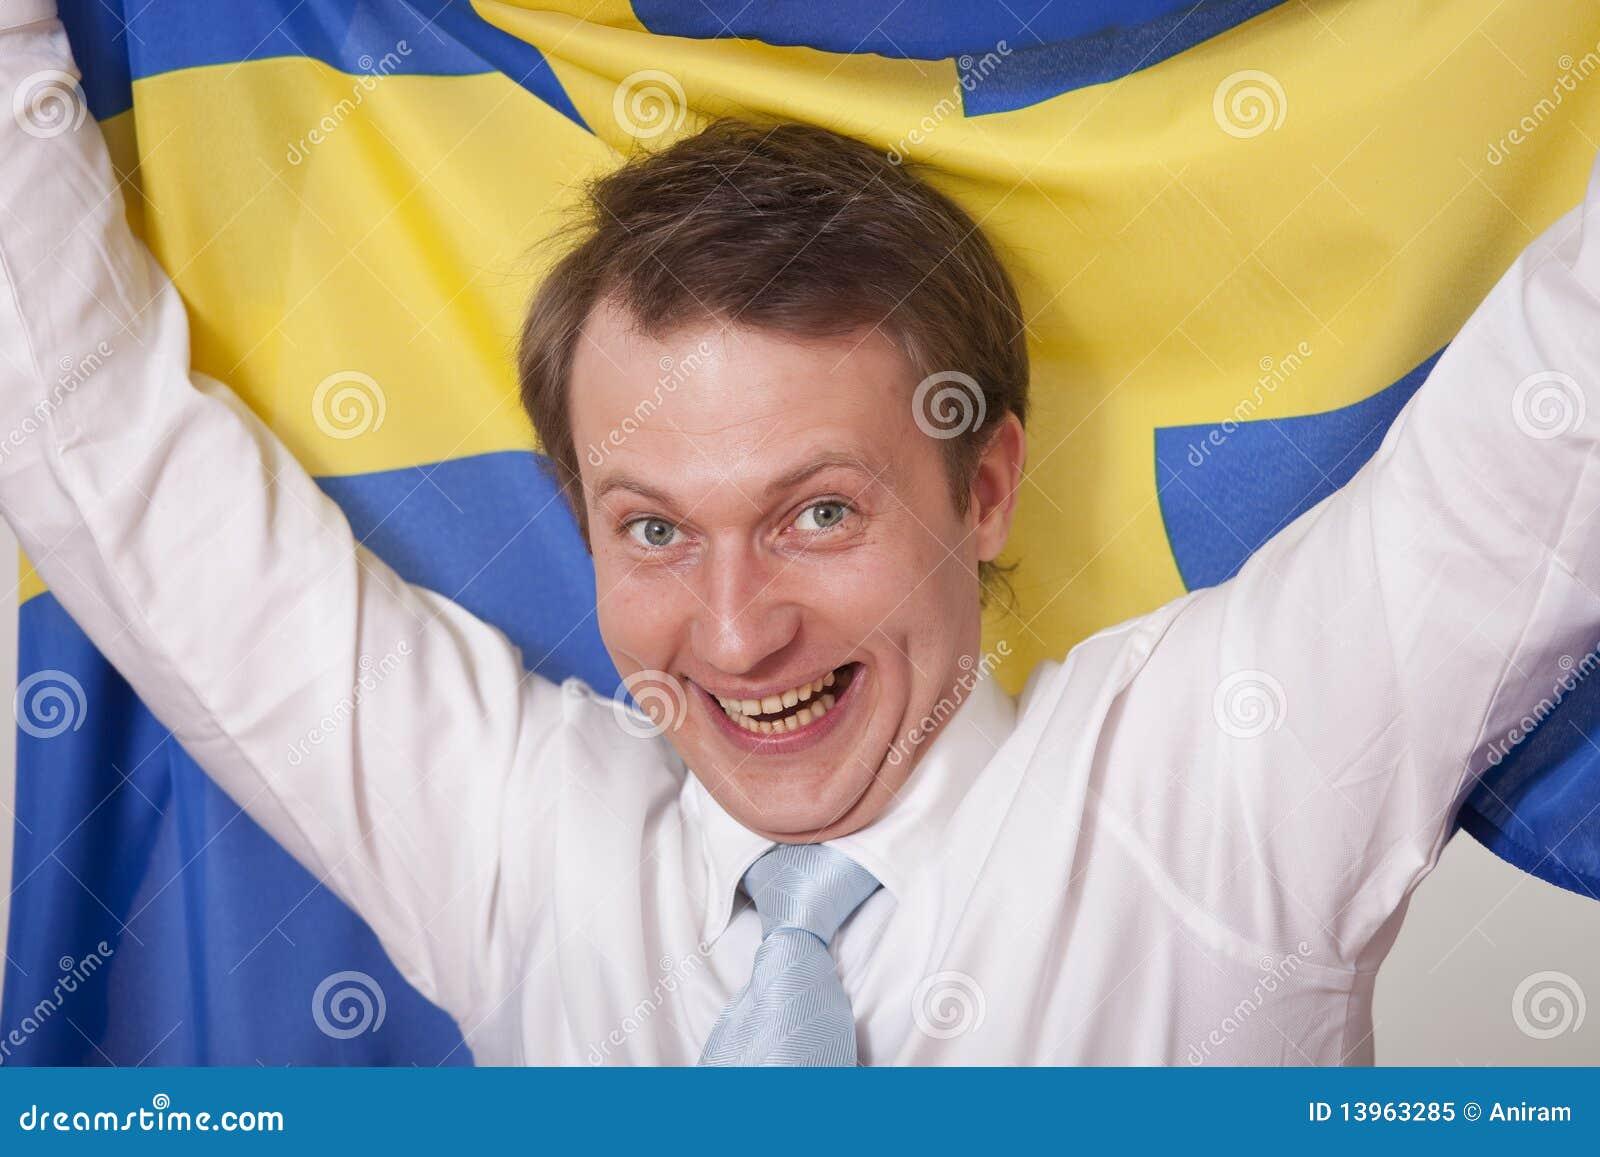 Fan with sweden flag